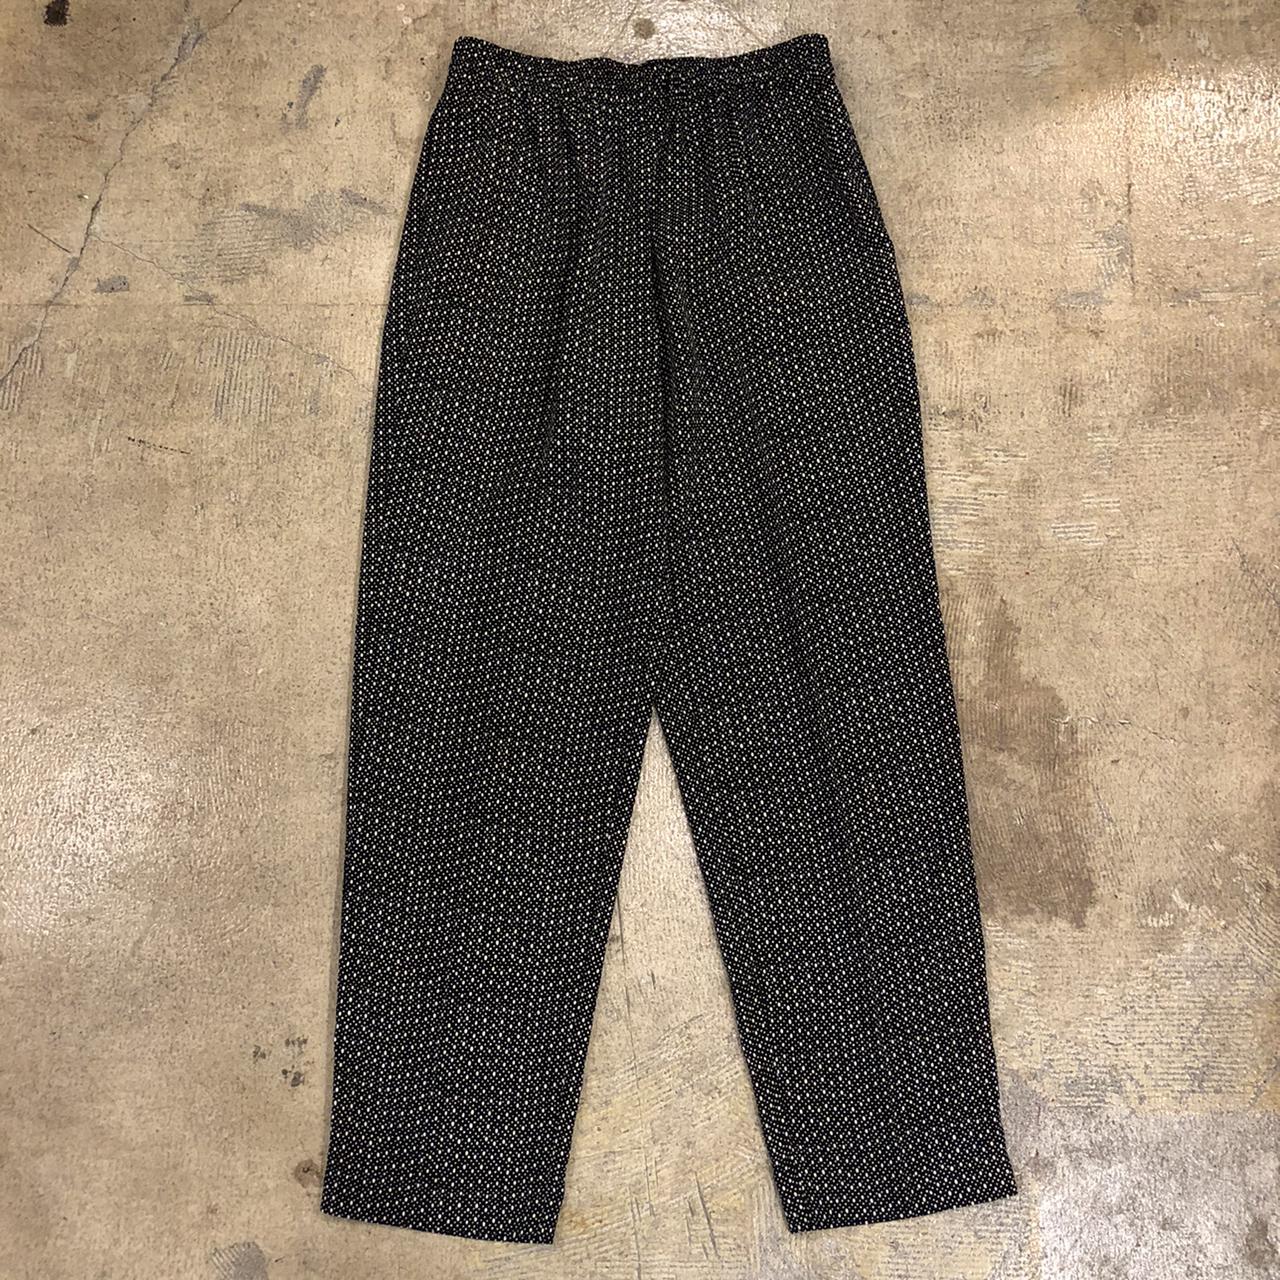 Alfreddunner Dot Easy Pants ¥5,200+tax